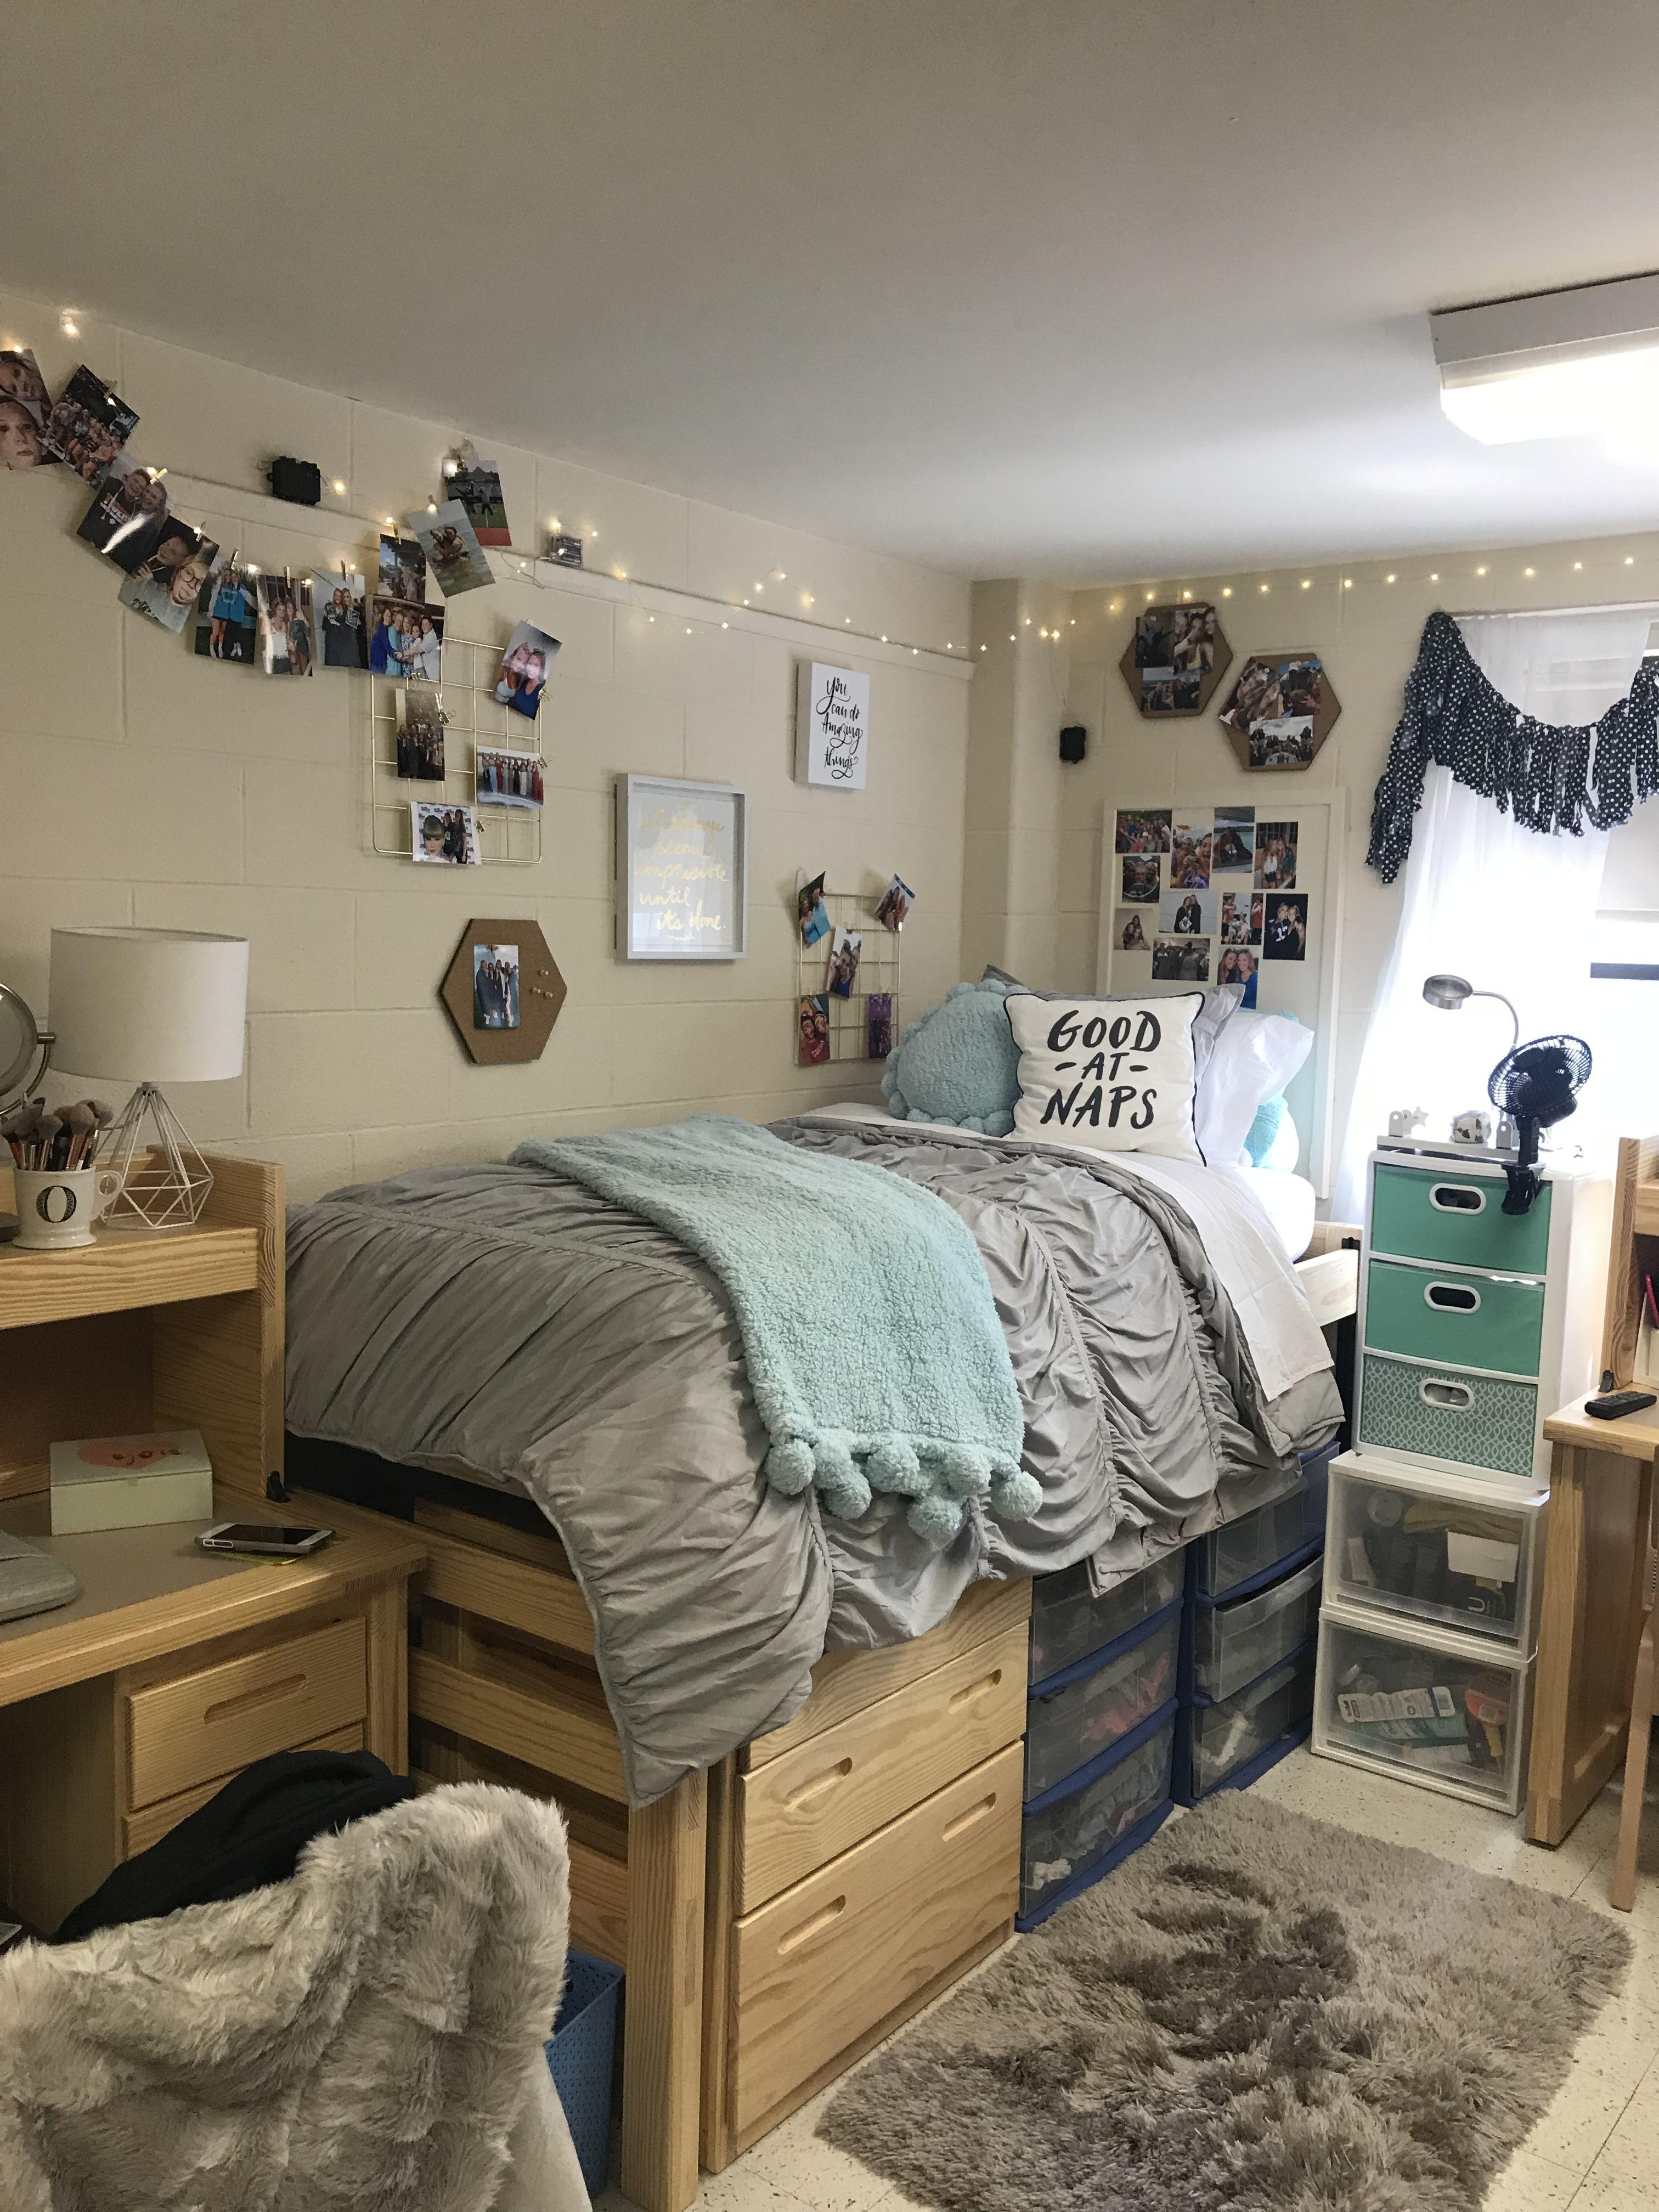 Fun Dorm Room Ideas: Pin By Madeline Hernandez On Dorm Room Ideas In 2019